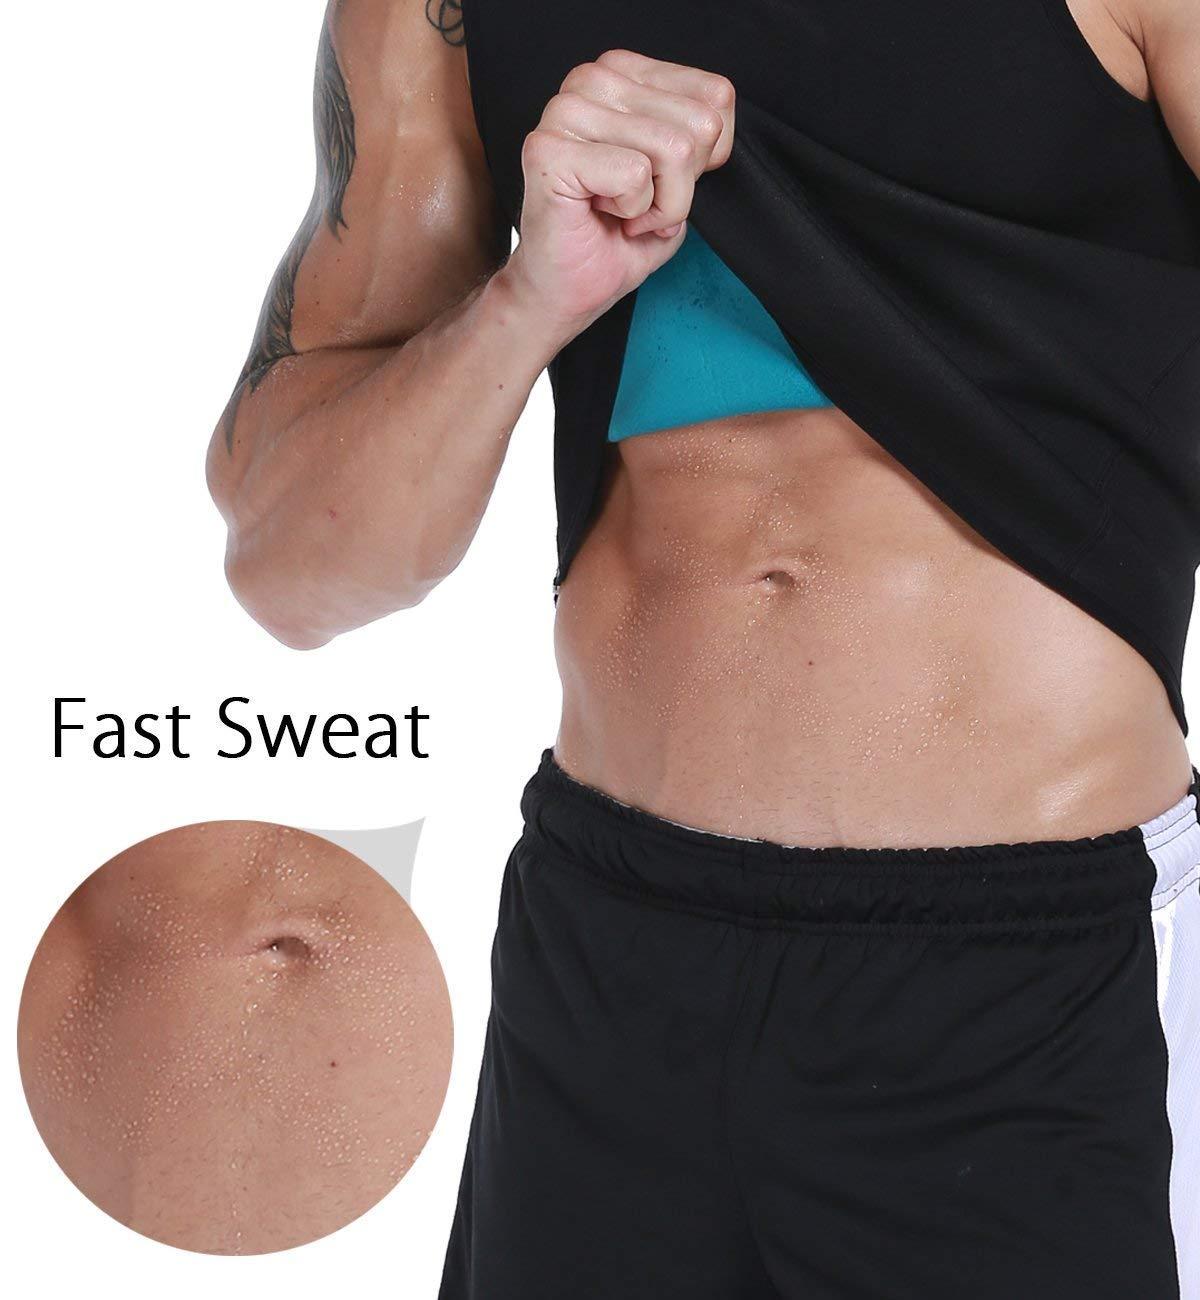 74893c2e57 Men Neoprene Waist Trainer Vest Weight Loss Hot Sweat Slimming Body Shaper  Sauna Tank Top Workout Shirt Shapewear No Zipper   Team Immortal   Forever  Fit ...